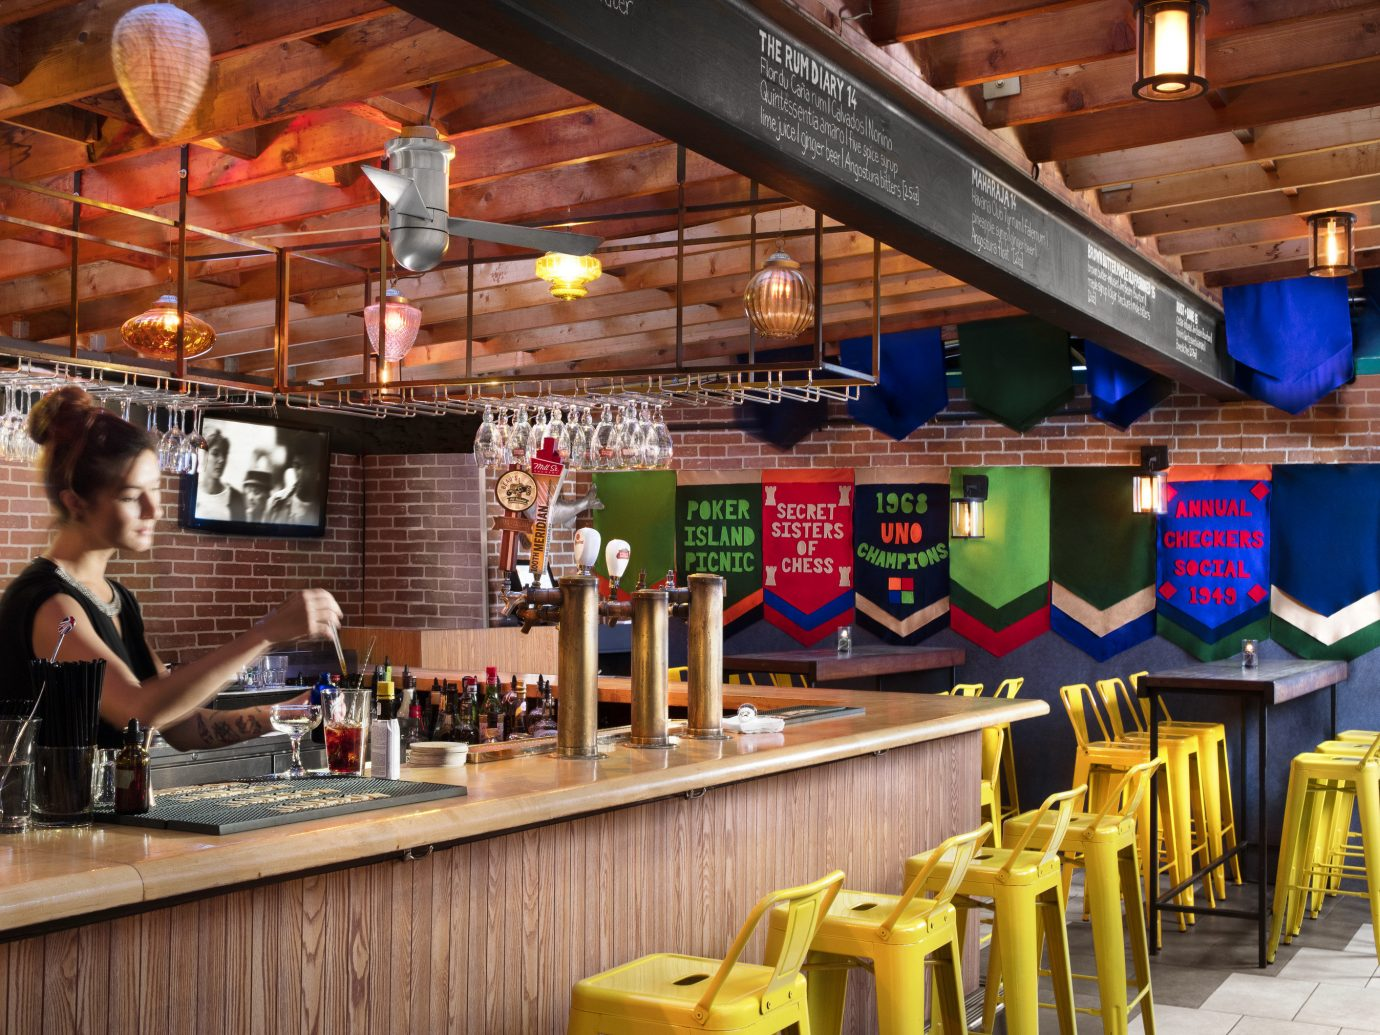 Canada Hotels Toronto indoor table ceiling restaurant Bar interior design counter fast food restaurant café tavern cafeteria Drink pub